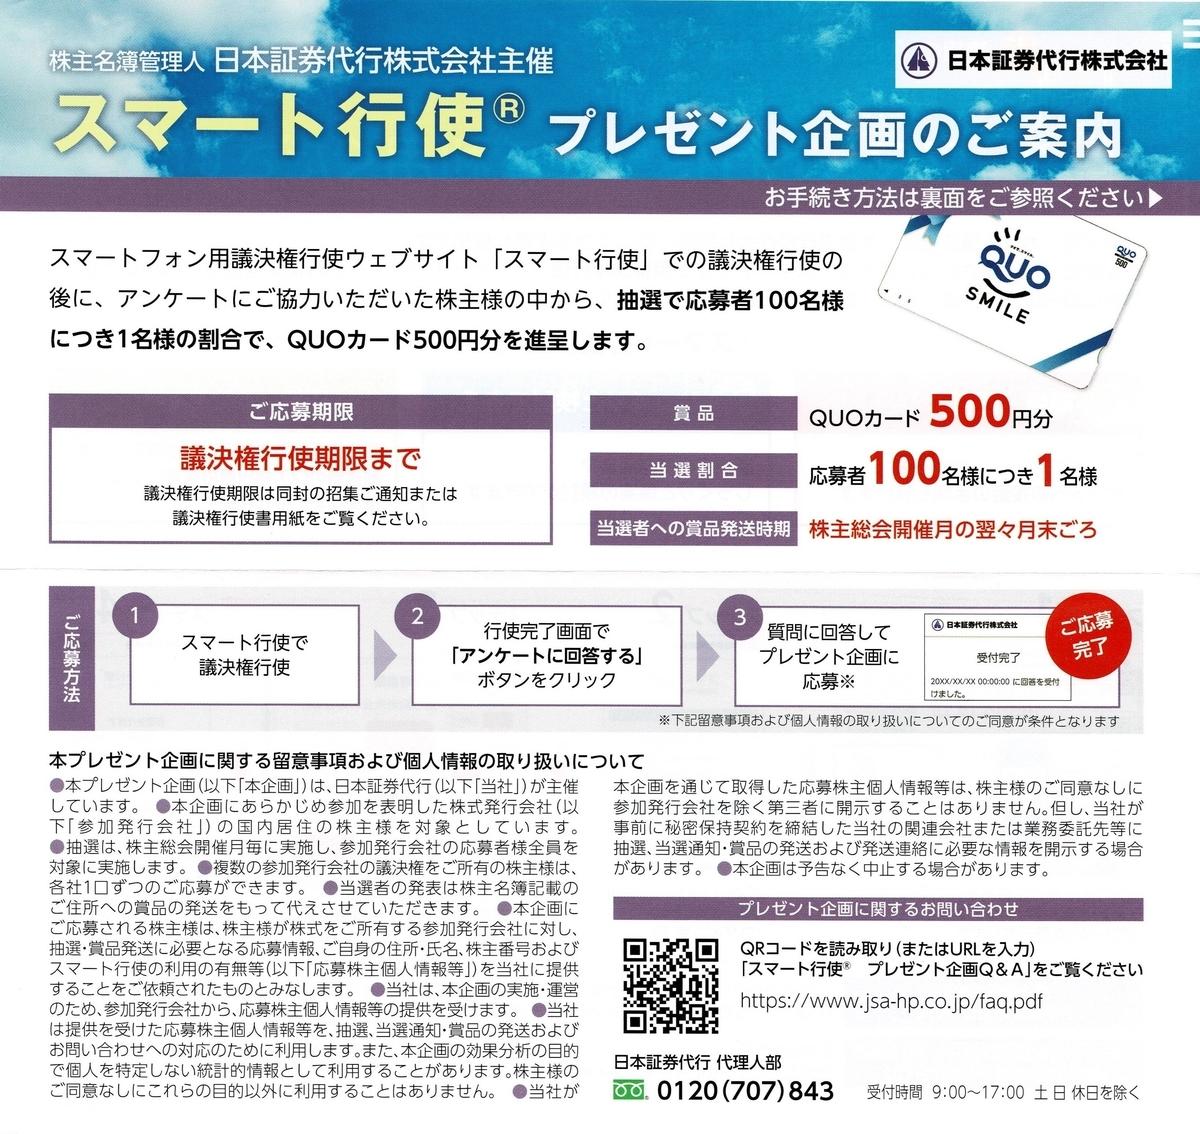 f:id:hanayamatoro:20210607223744j:plain